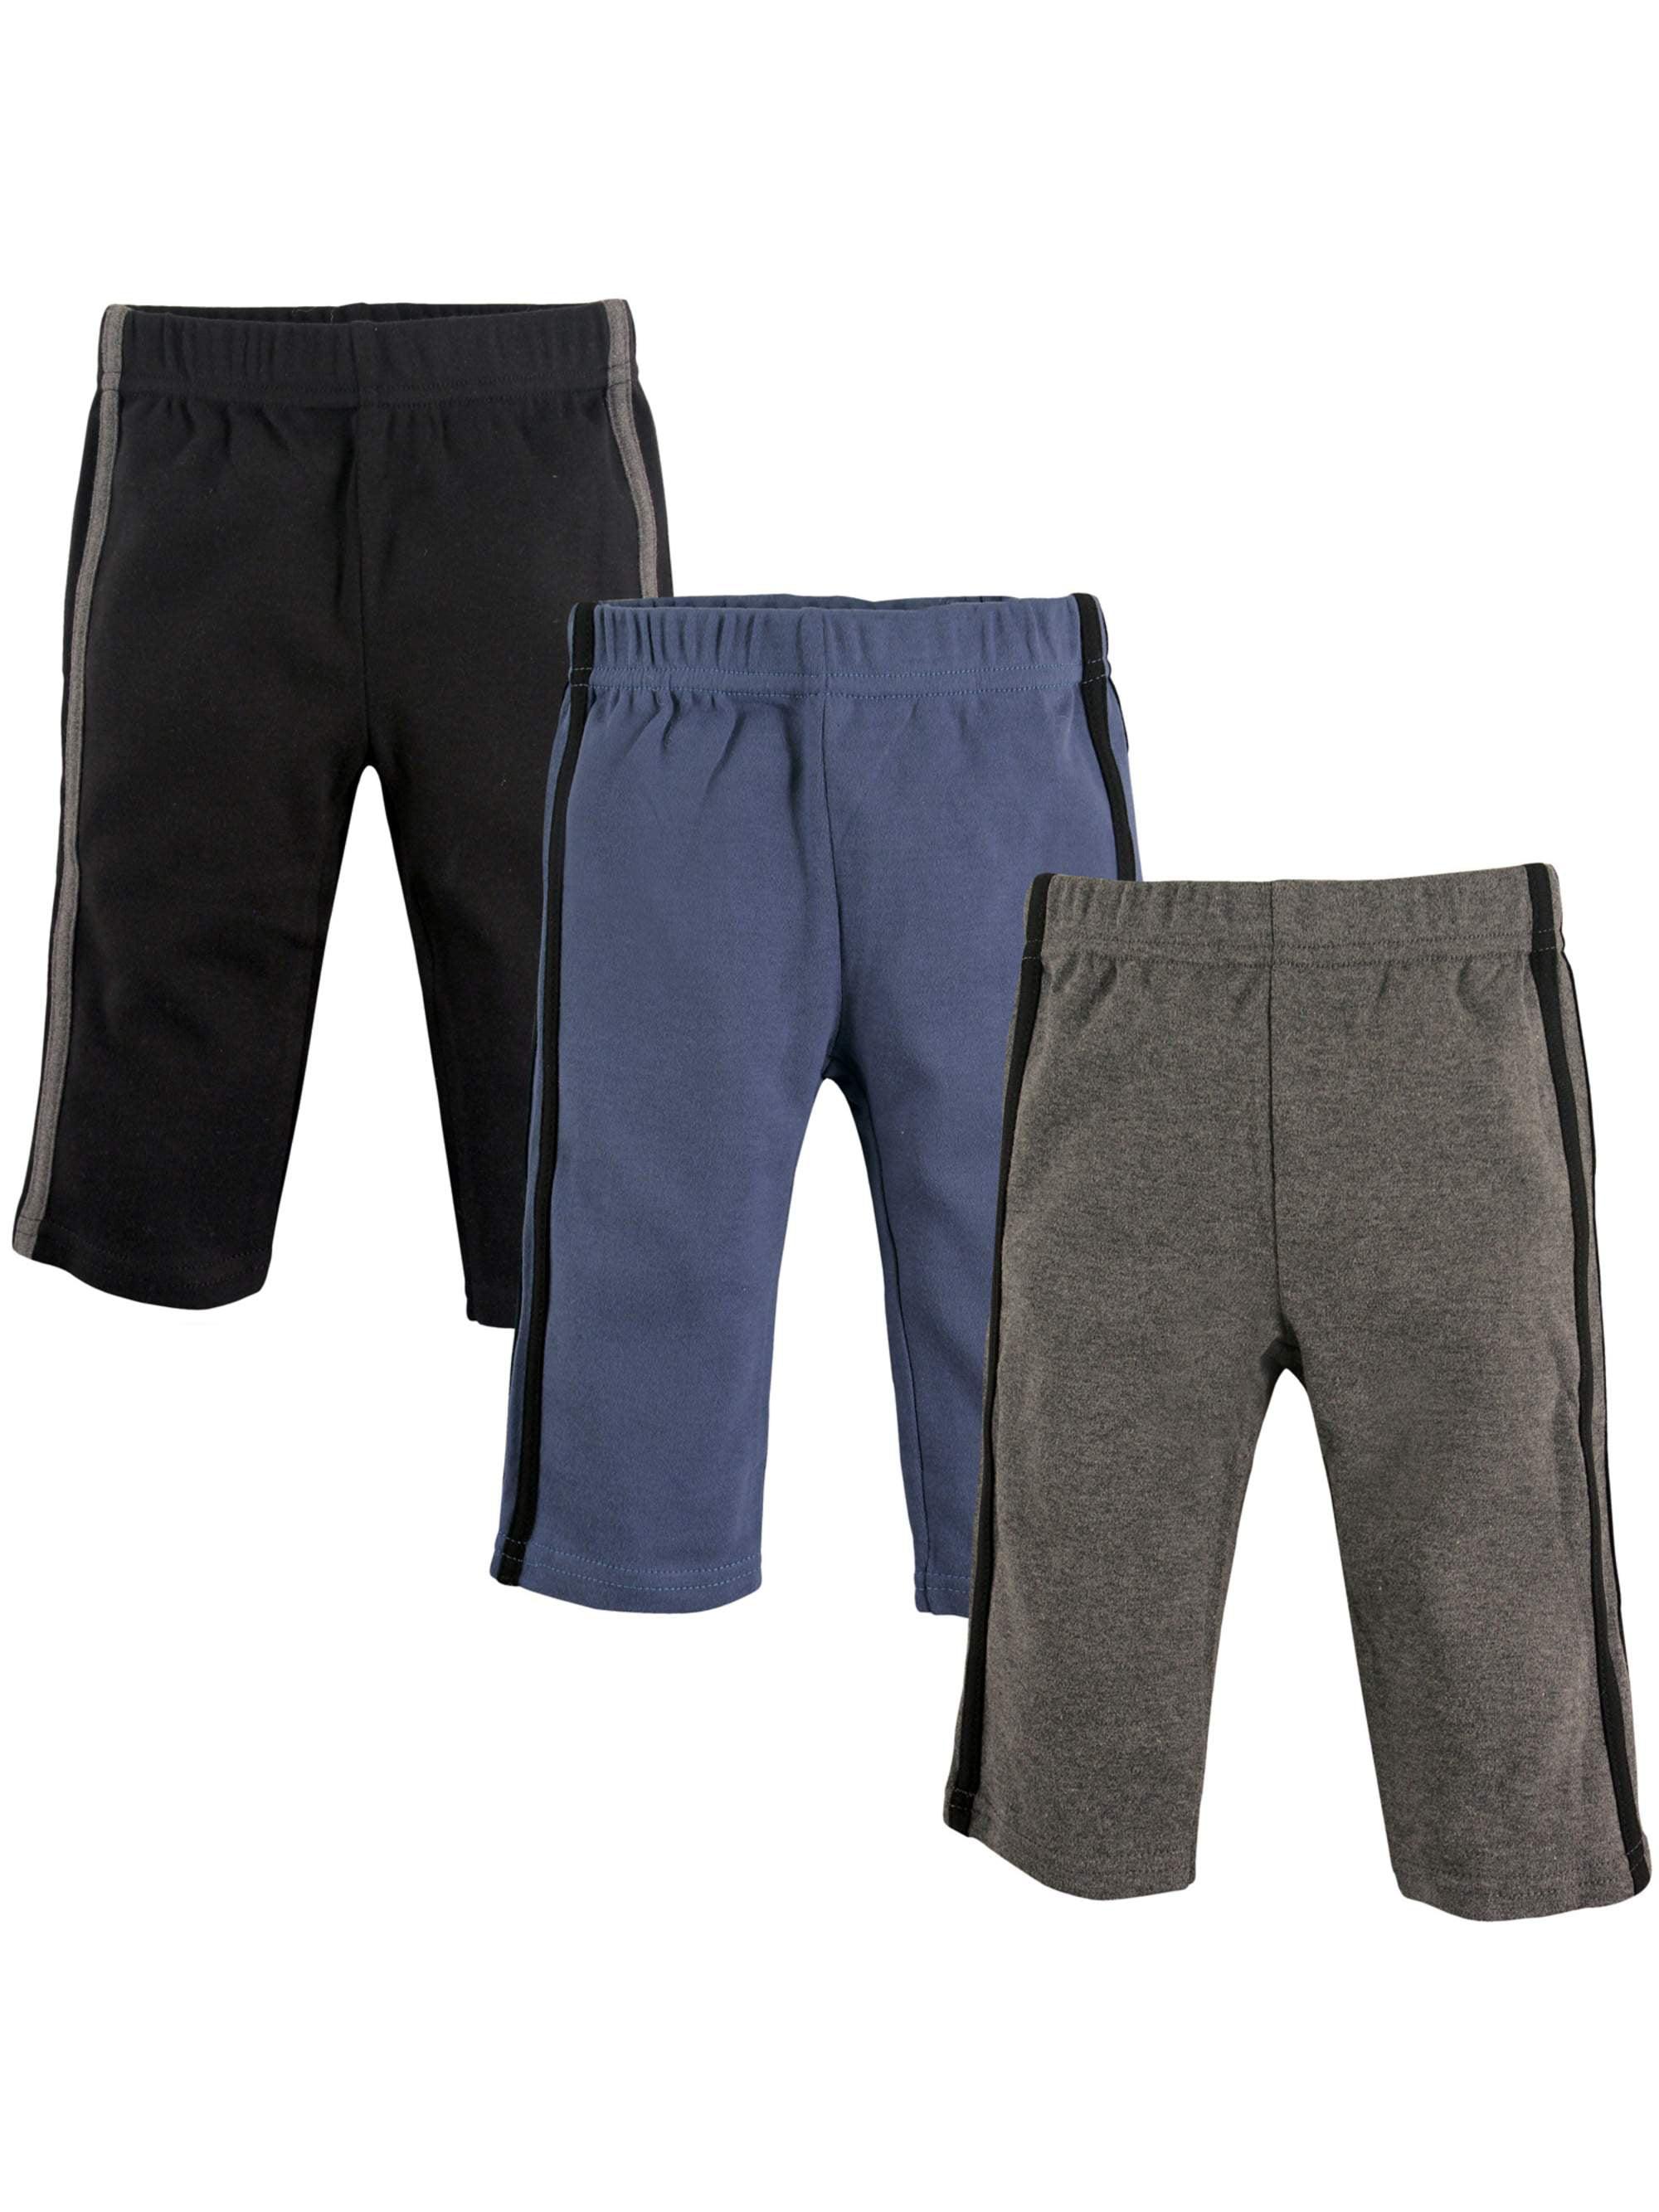 Boy Pants, 3-Pack